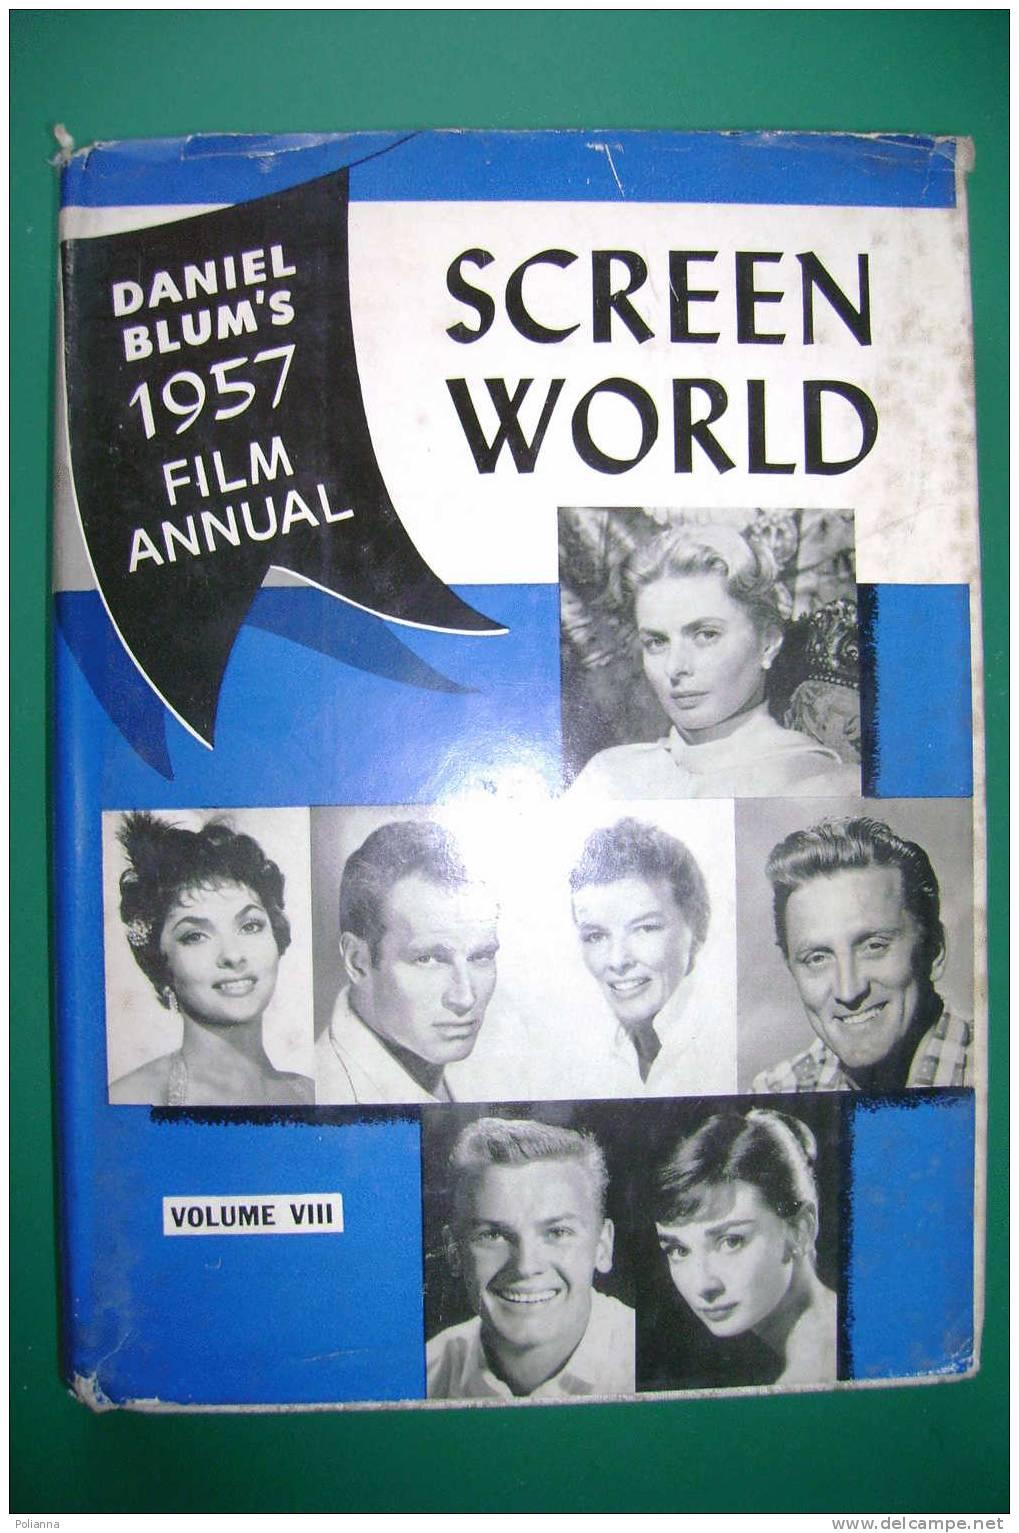 PDI/7 Daniel Blum's 1957 FILM ANNUAL SCREEN WORLD V.VIII/Ingrid Bergman/Humphrey Bogart/Marylin Monroe/Elvis Presley - Films